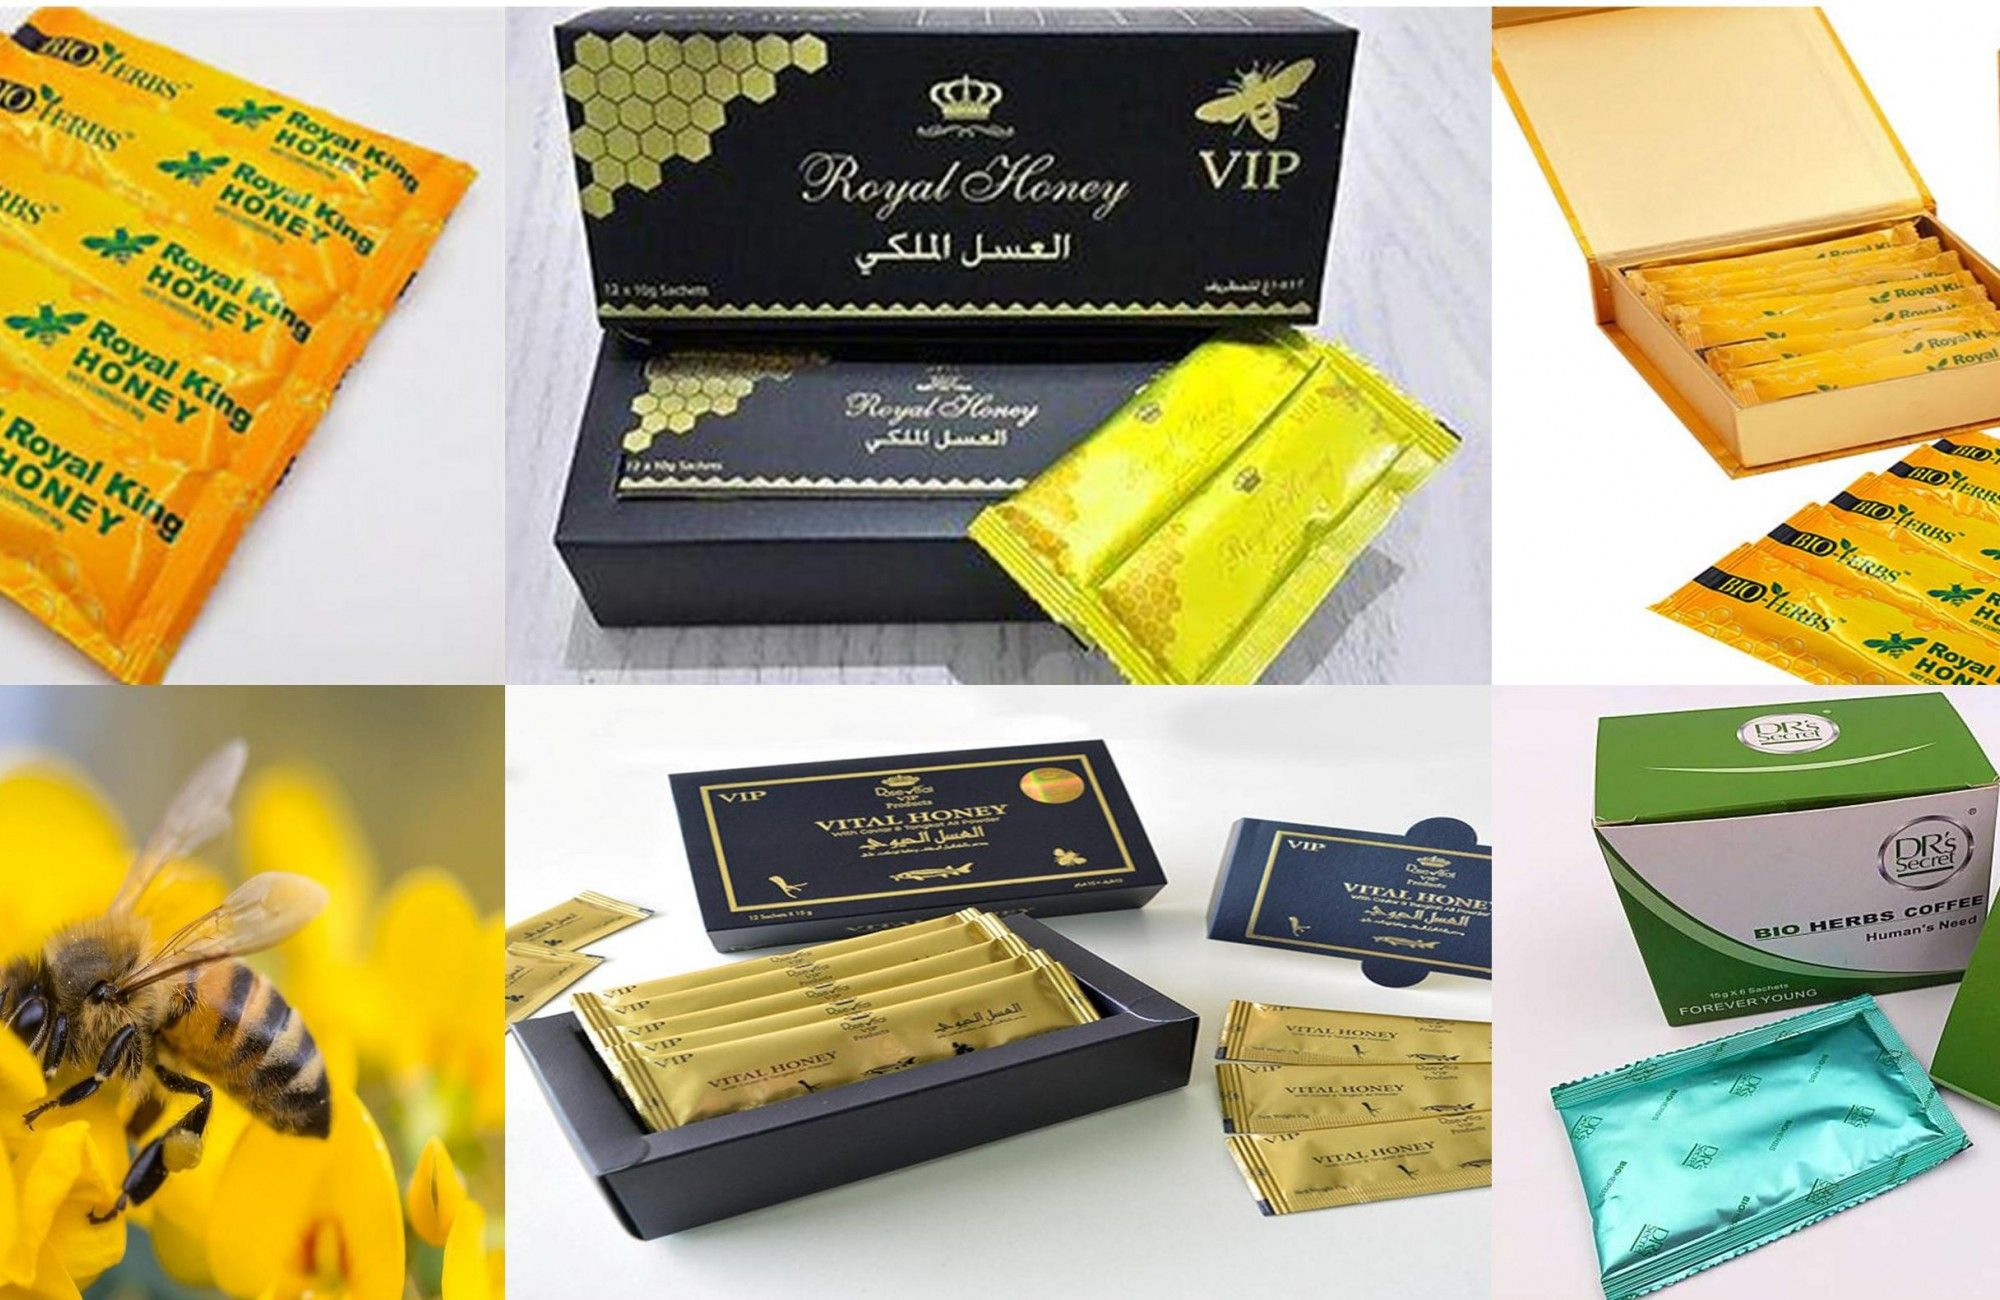 Wholesale Etumax Royal Honey Vip Malaysia Honey For Men For Him Her Vital Honey العسل الملكي الماليزي بيع جملة الشاي الاخضر الماليزي Manawa Honey Sachet